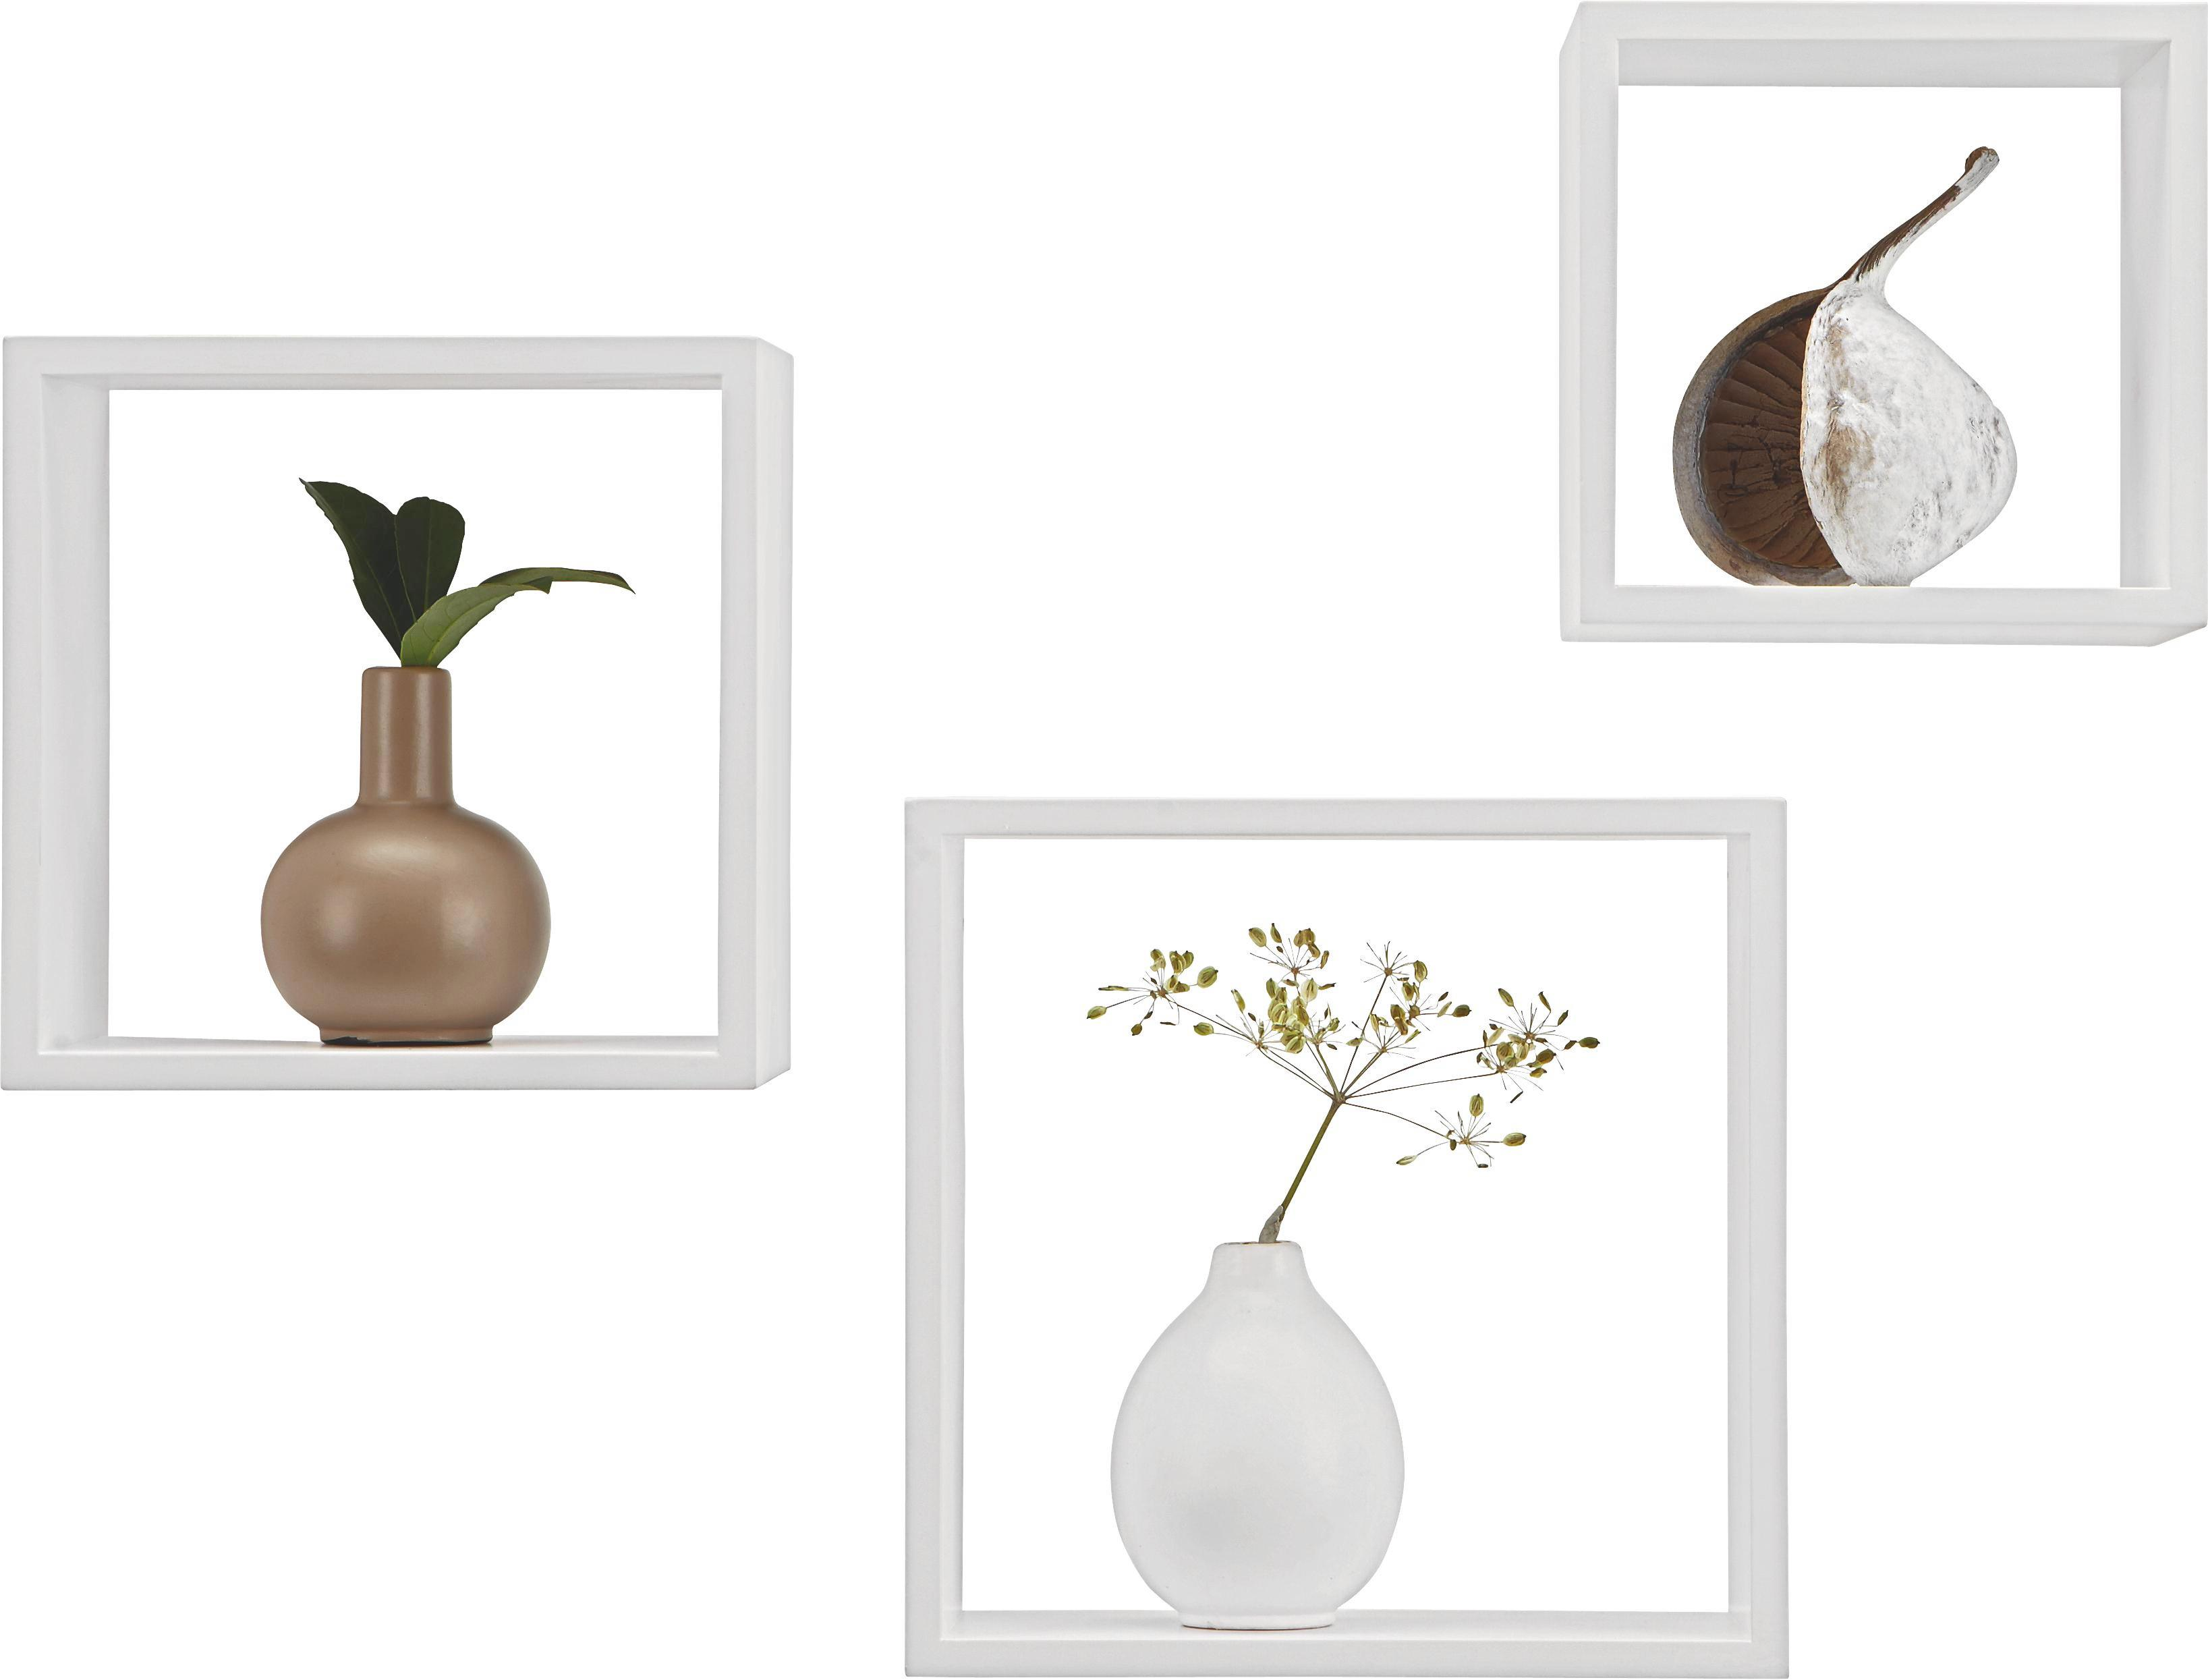 Wandregal in Weiß - Weiß, Holzwerkstoff/Kunststoff (28/24/12cm) - MÖMAX modern living